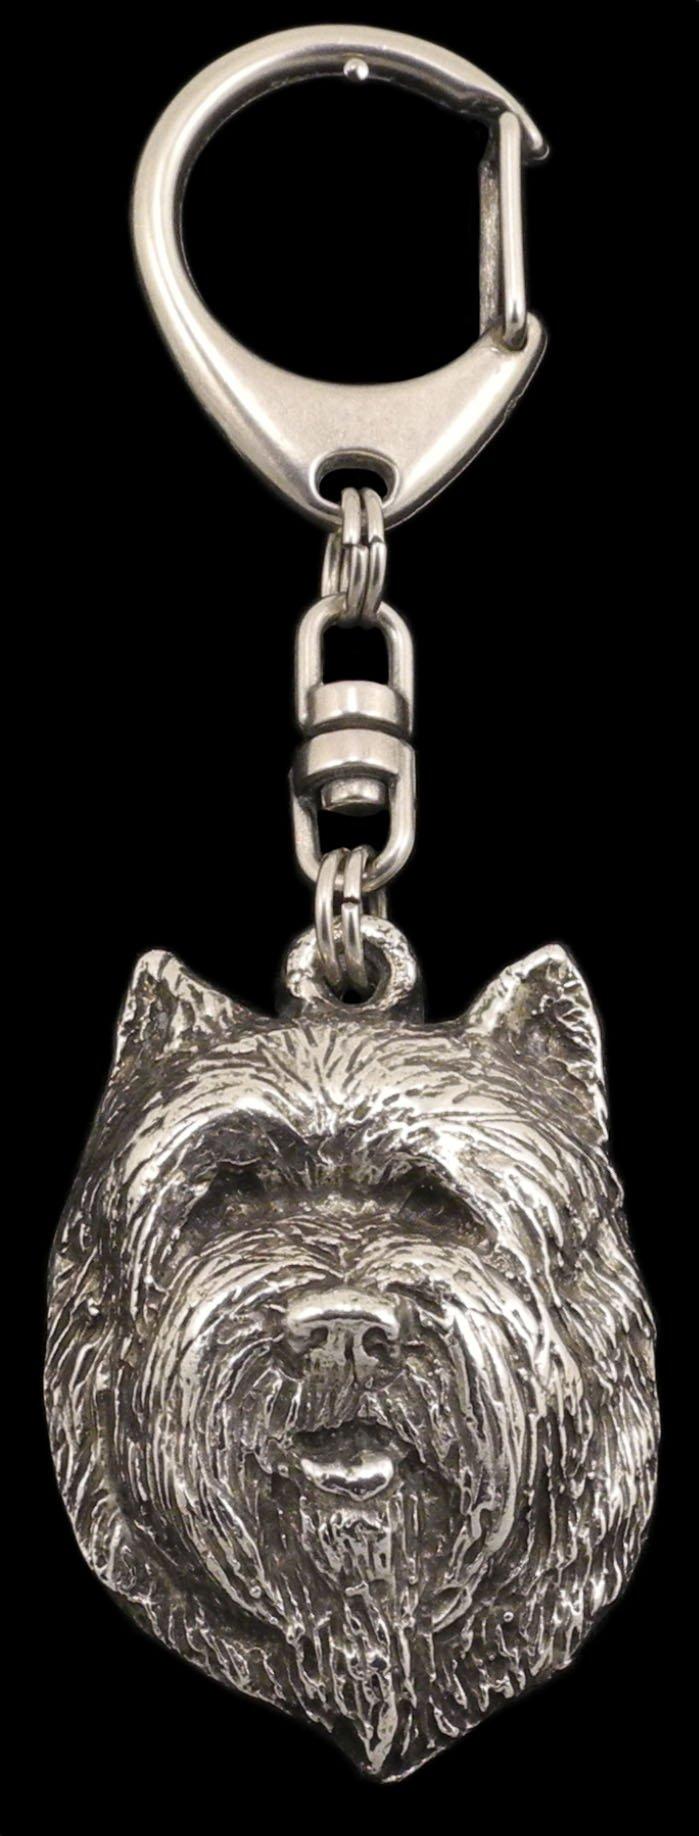 Cairn Terrier (Front), Silver Hallmark 925, Silver Dog Keyring, Keychain, Limited Edition, Artdog